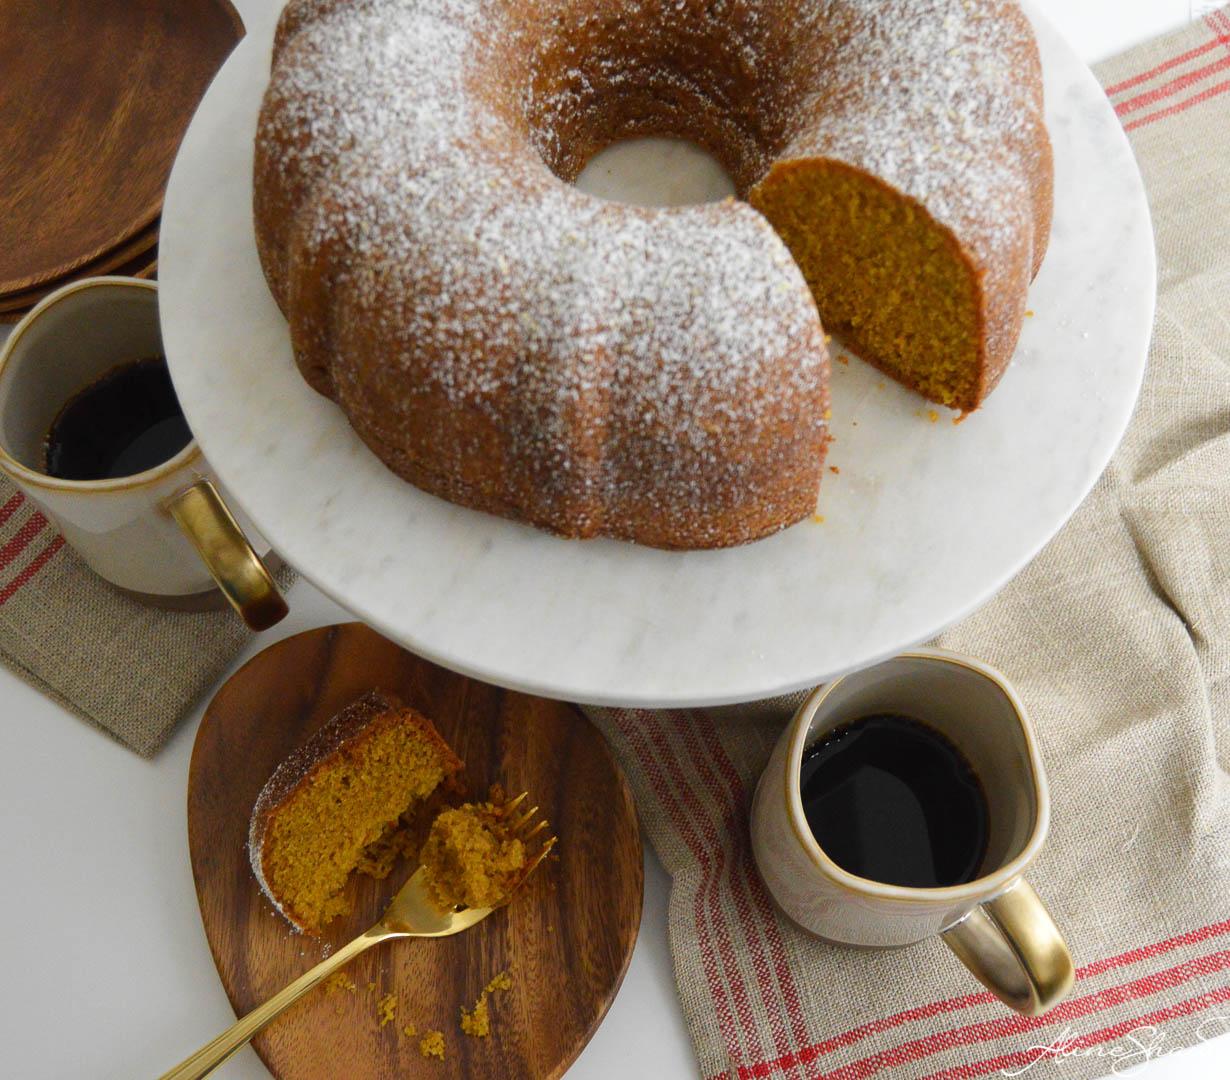 Spiced Brown Sugar Cake